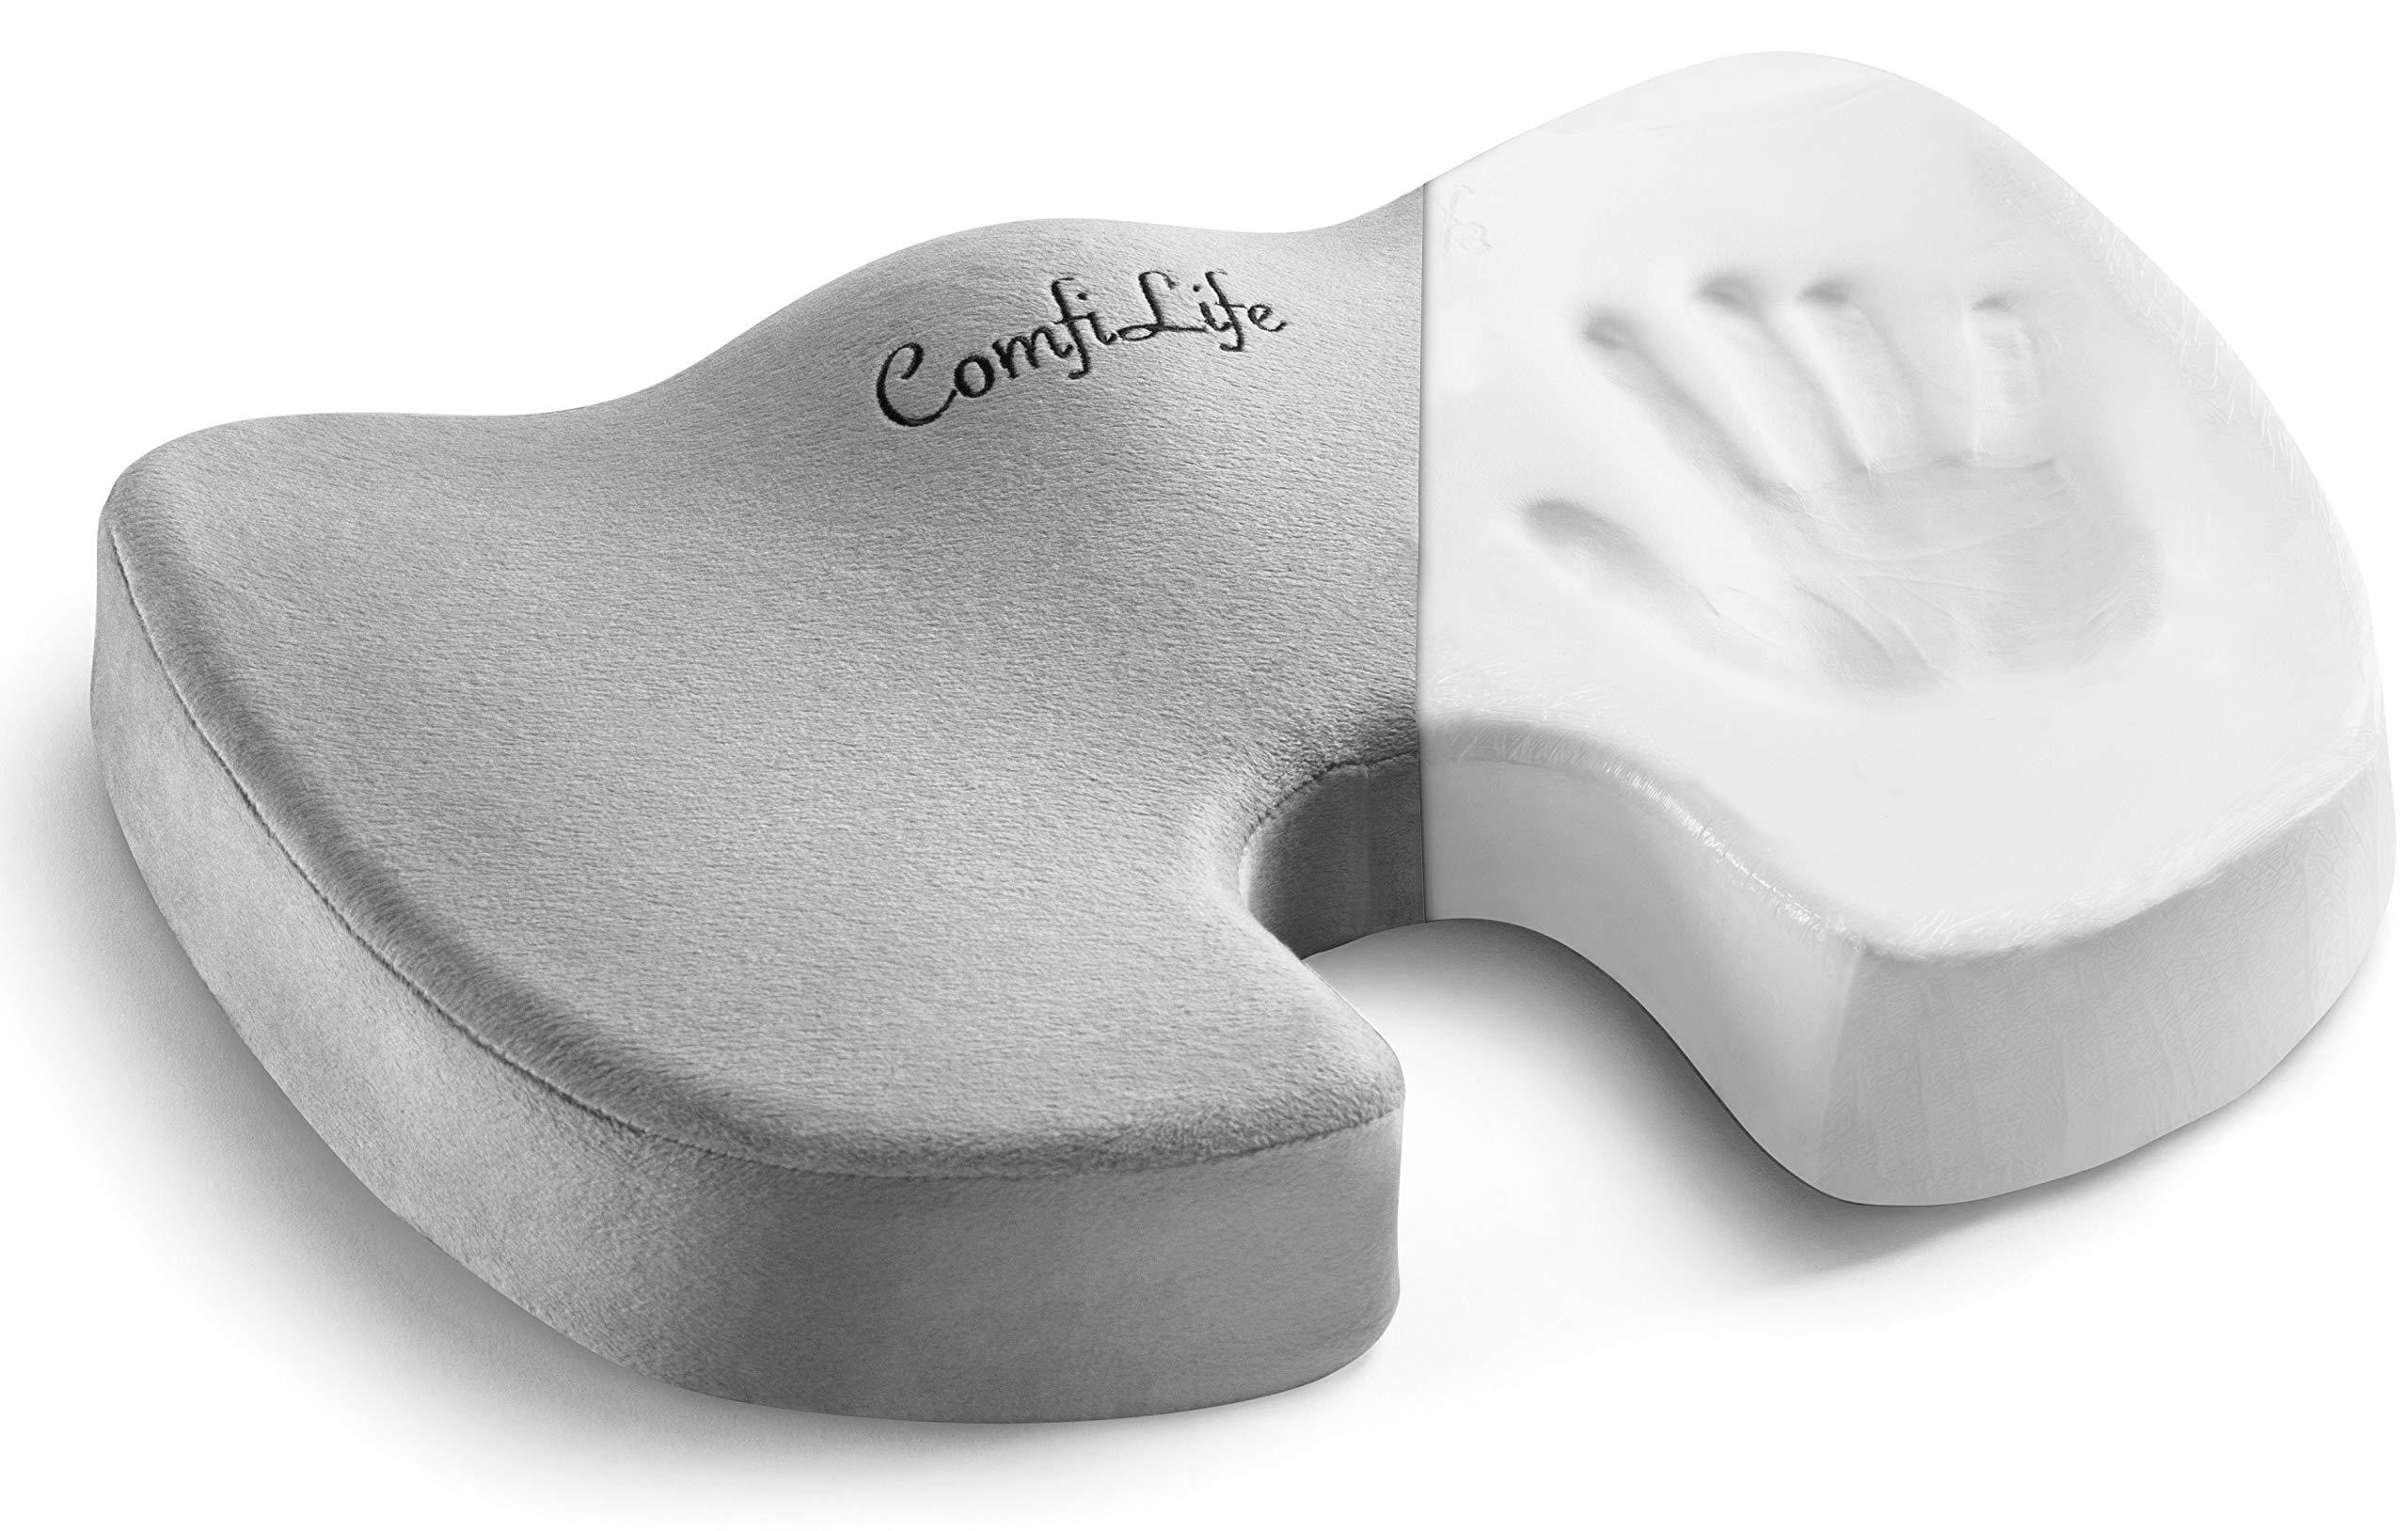 ComfiLife Premium Comfort Seat Cushion - Non-Slip Orthopedic 100% Memory Foam Coccyx Cushion for Tailbone Pain - Cushion for Office Chair Car Seat - Back Pain & Sciatica Relief